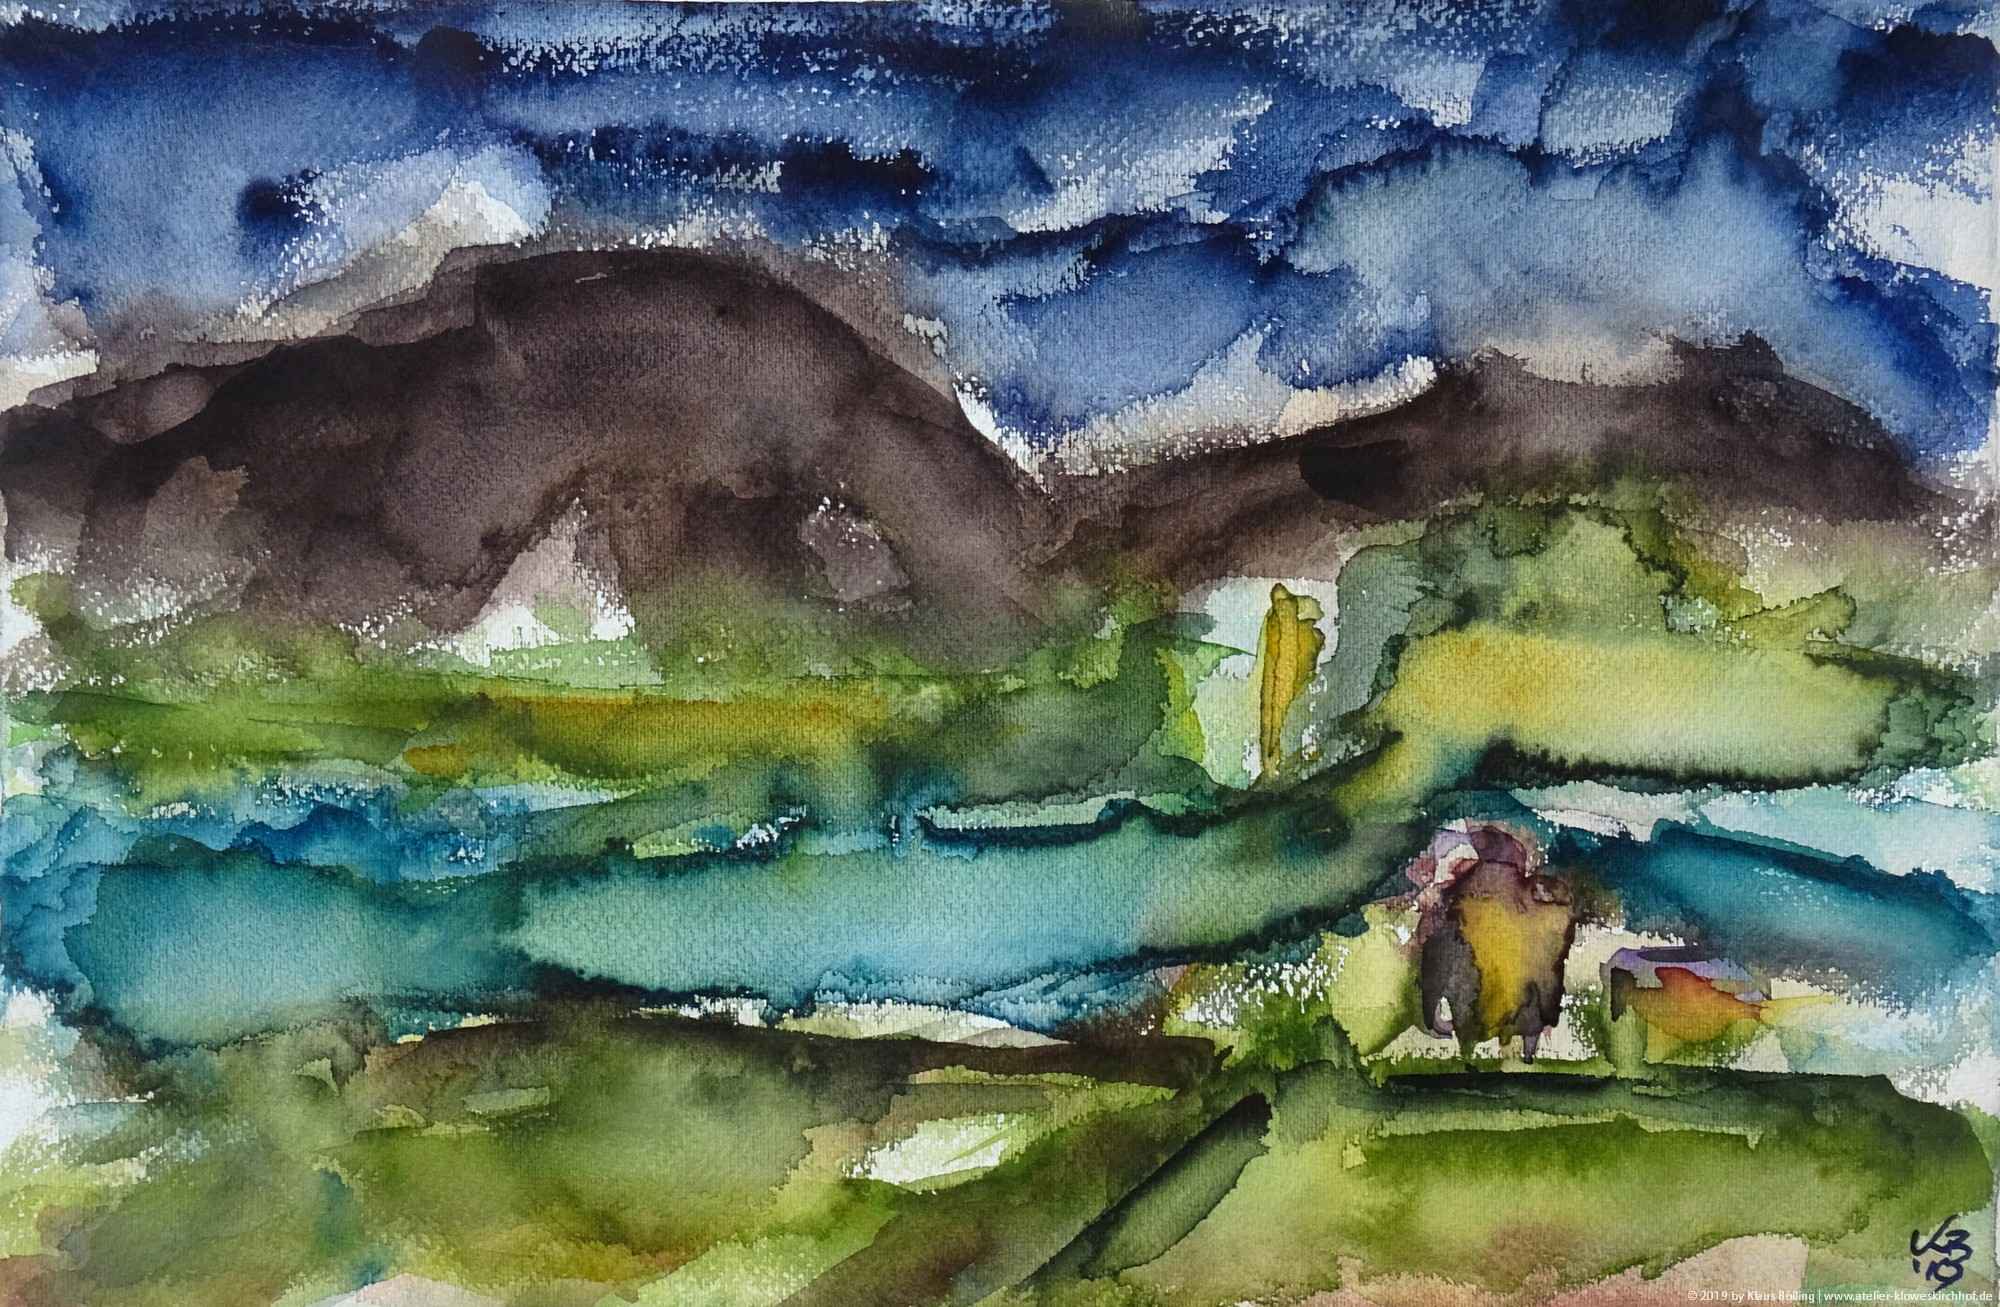 Orkney, Sound of Hoy (Graemsay, Hoy), Watercolour 50 x 32,5 cm, © 2019 by Klaus Bölling